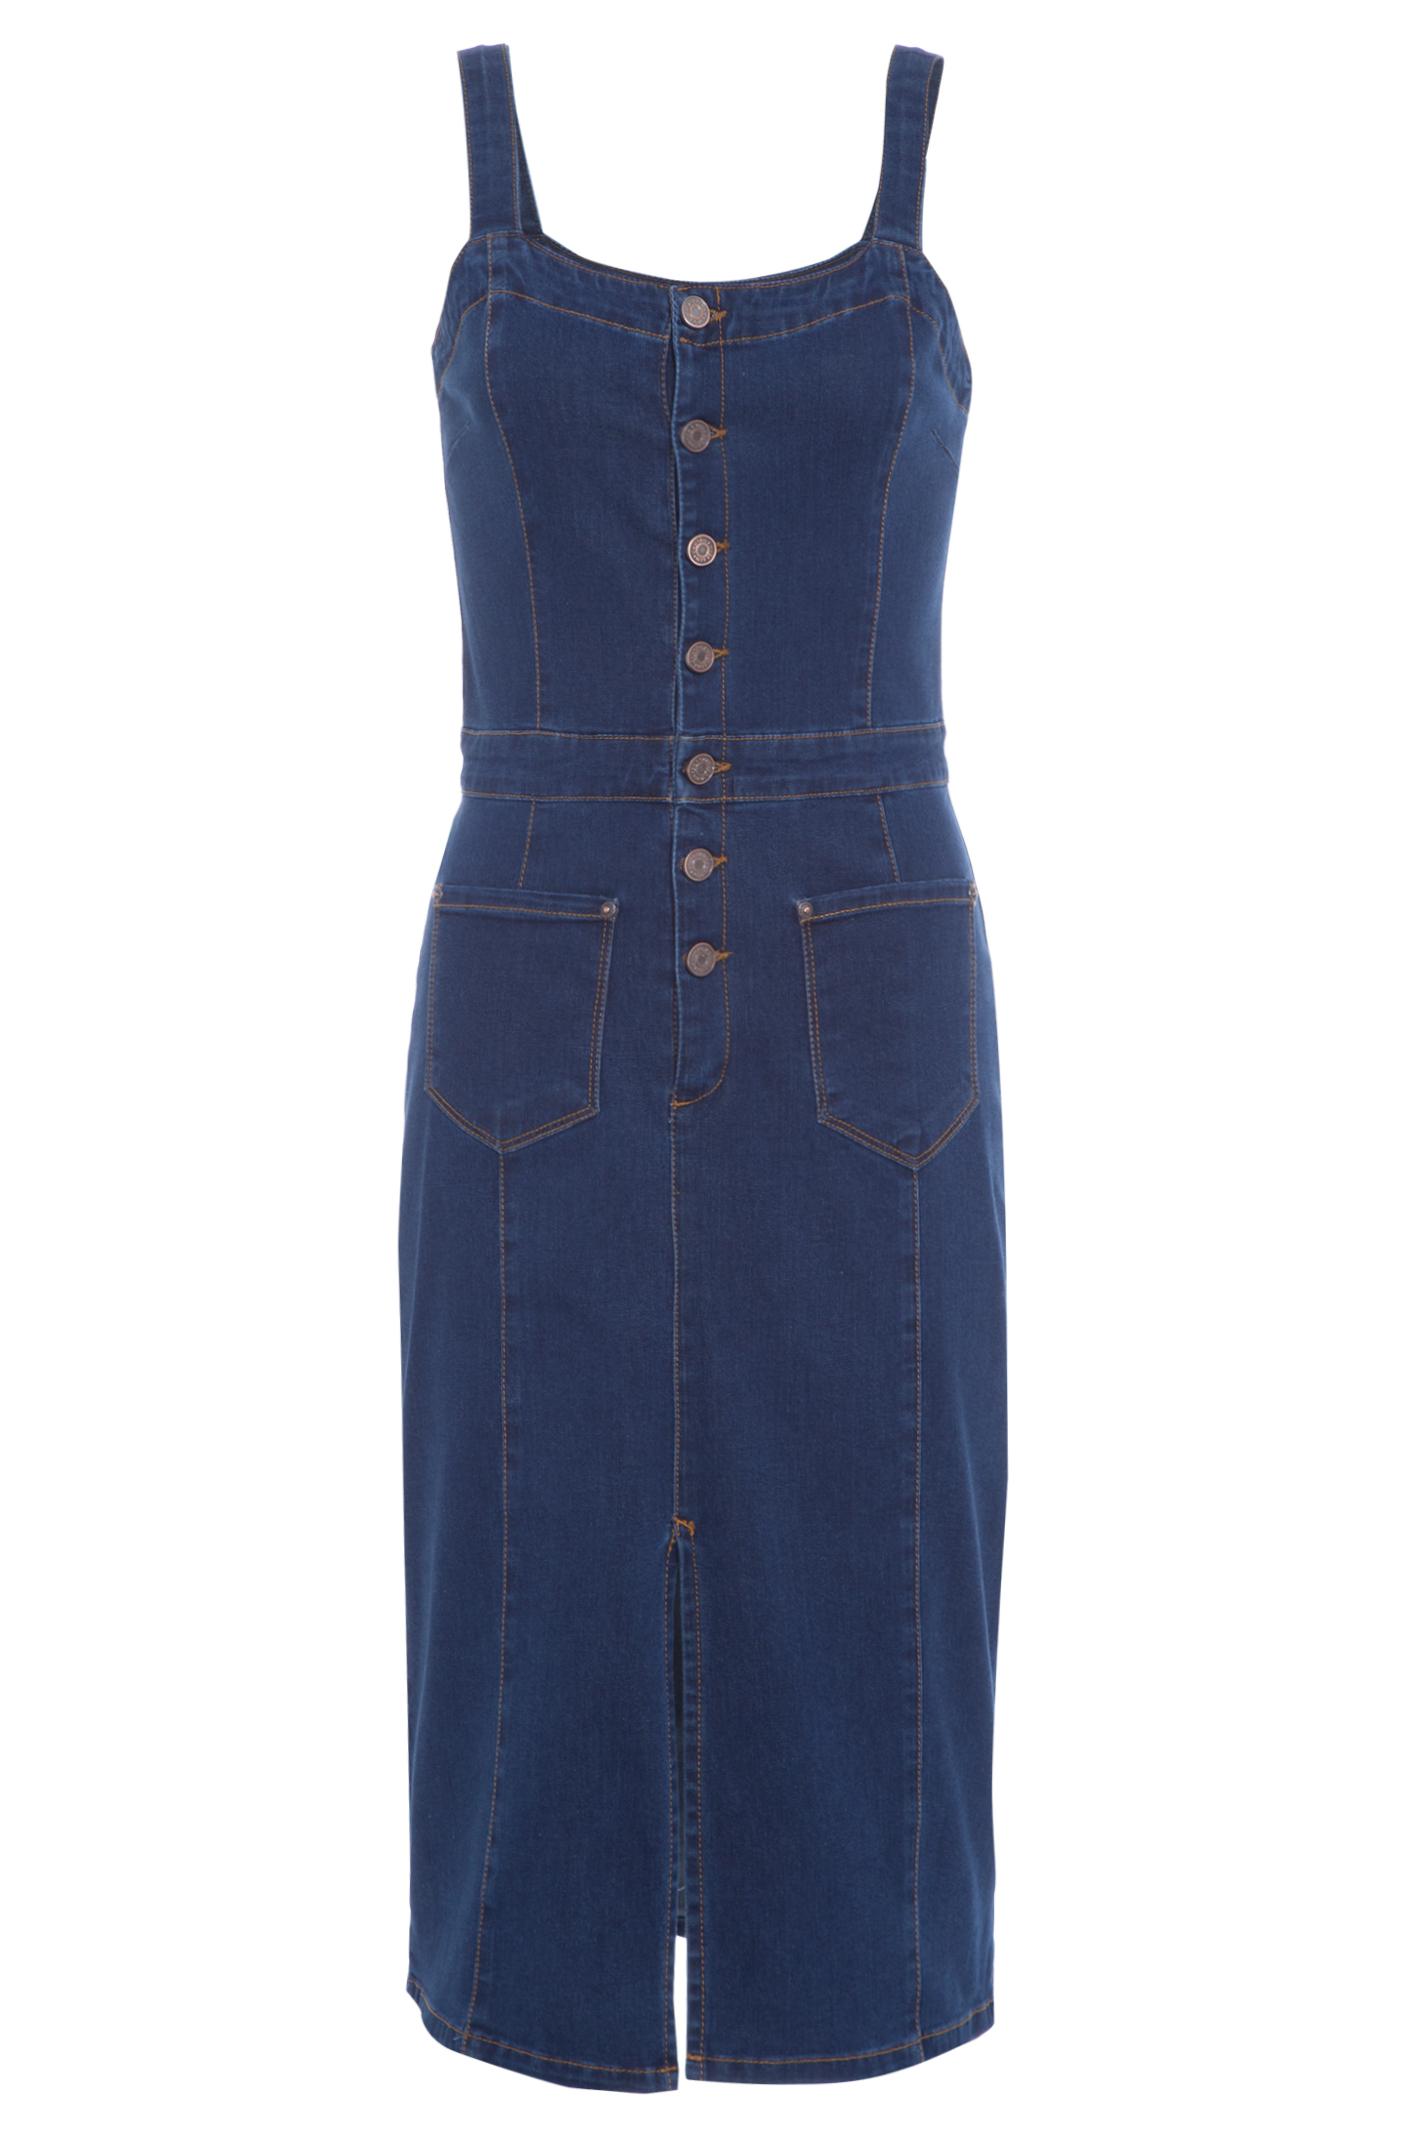 Vestido Jeans Jardineira Comfort L71